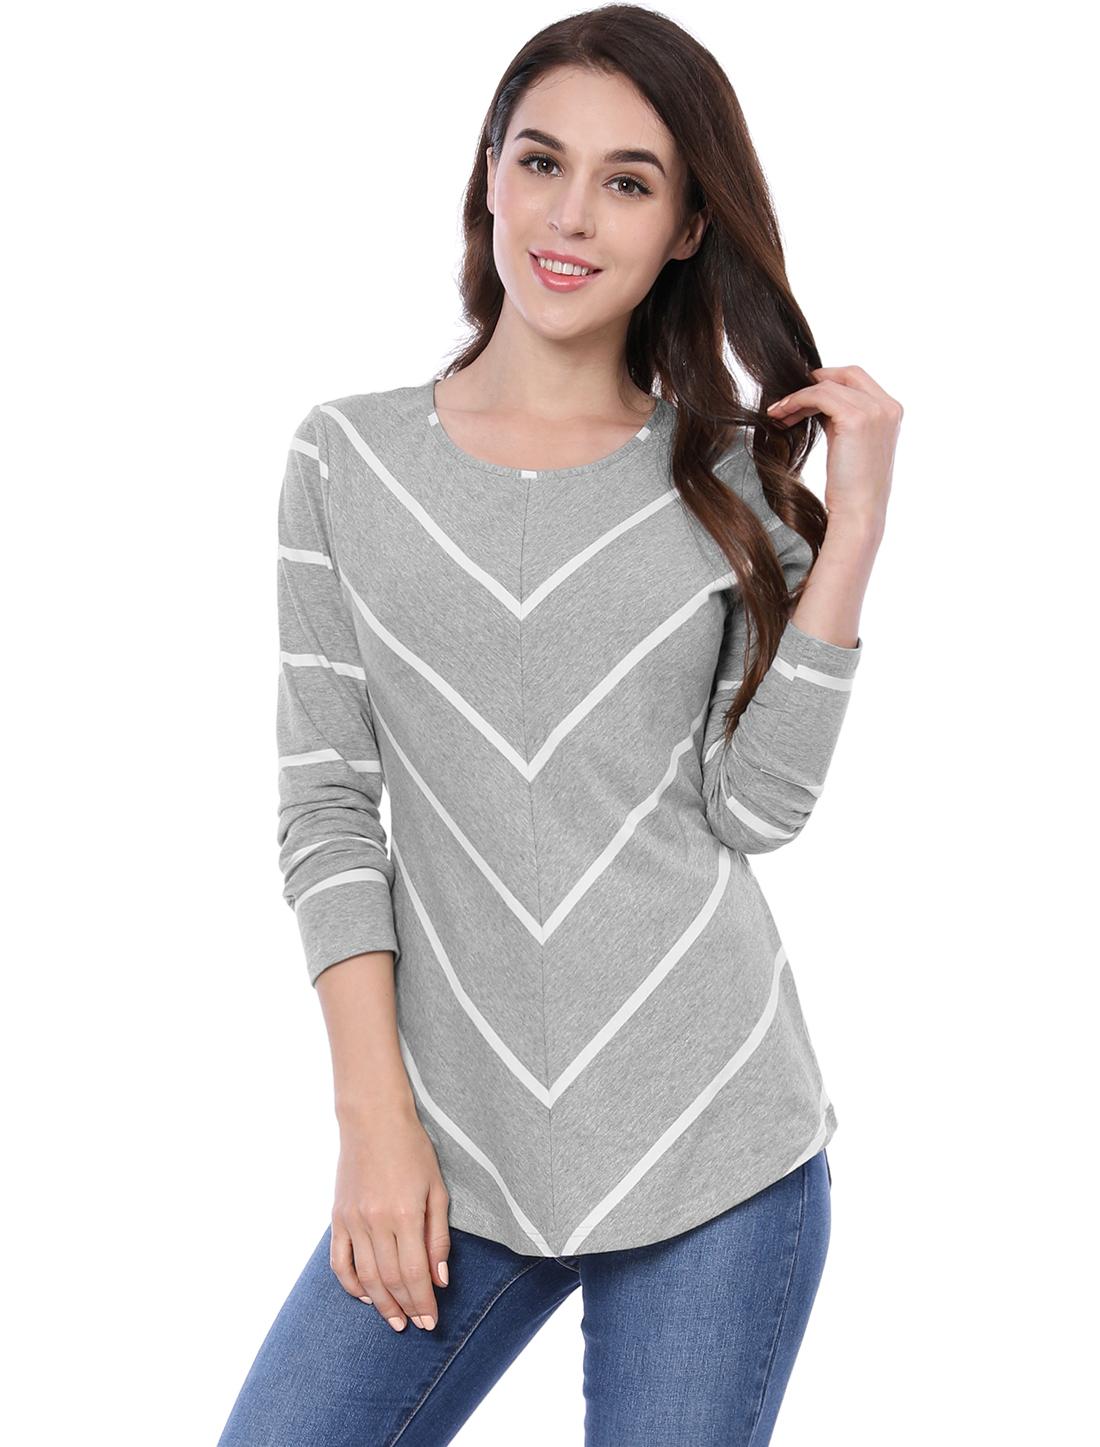 Women Long Sleeves Scoop Neck Striped Chevron Print Top Gray M